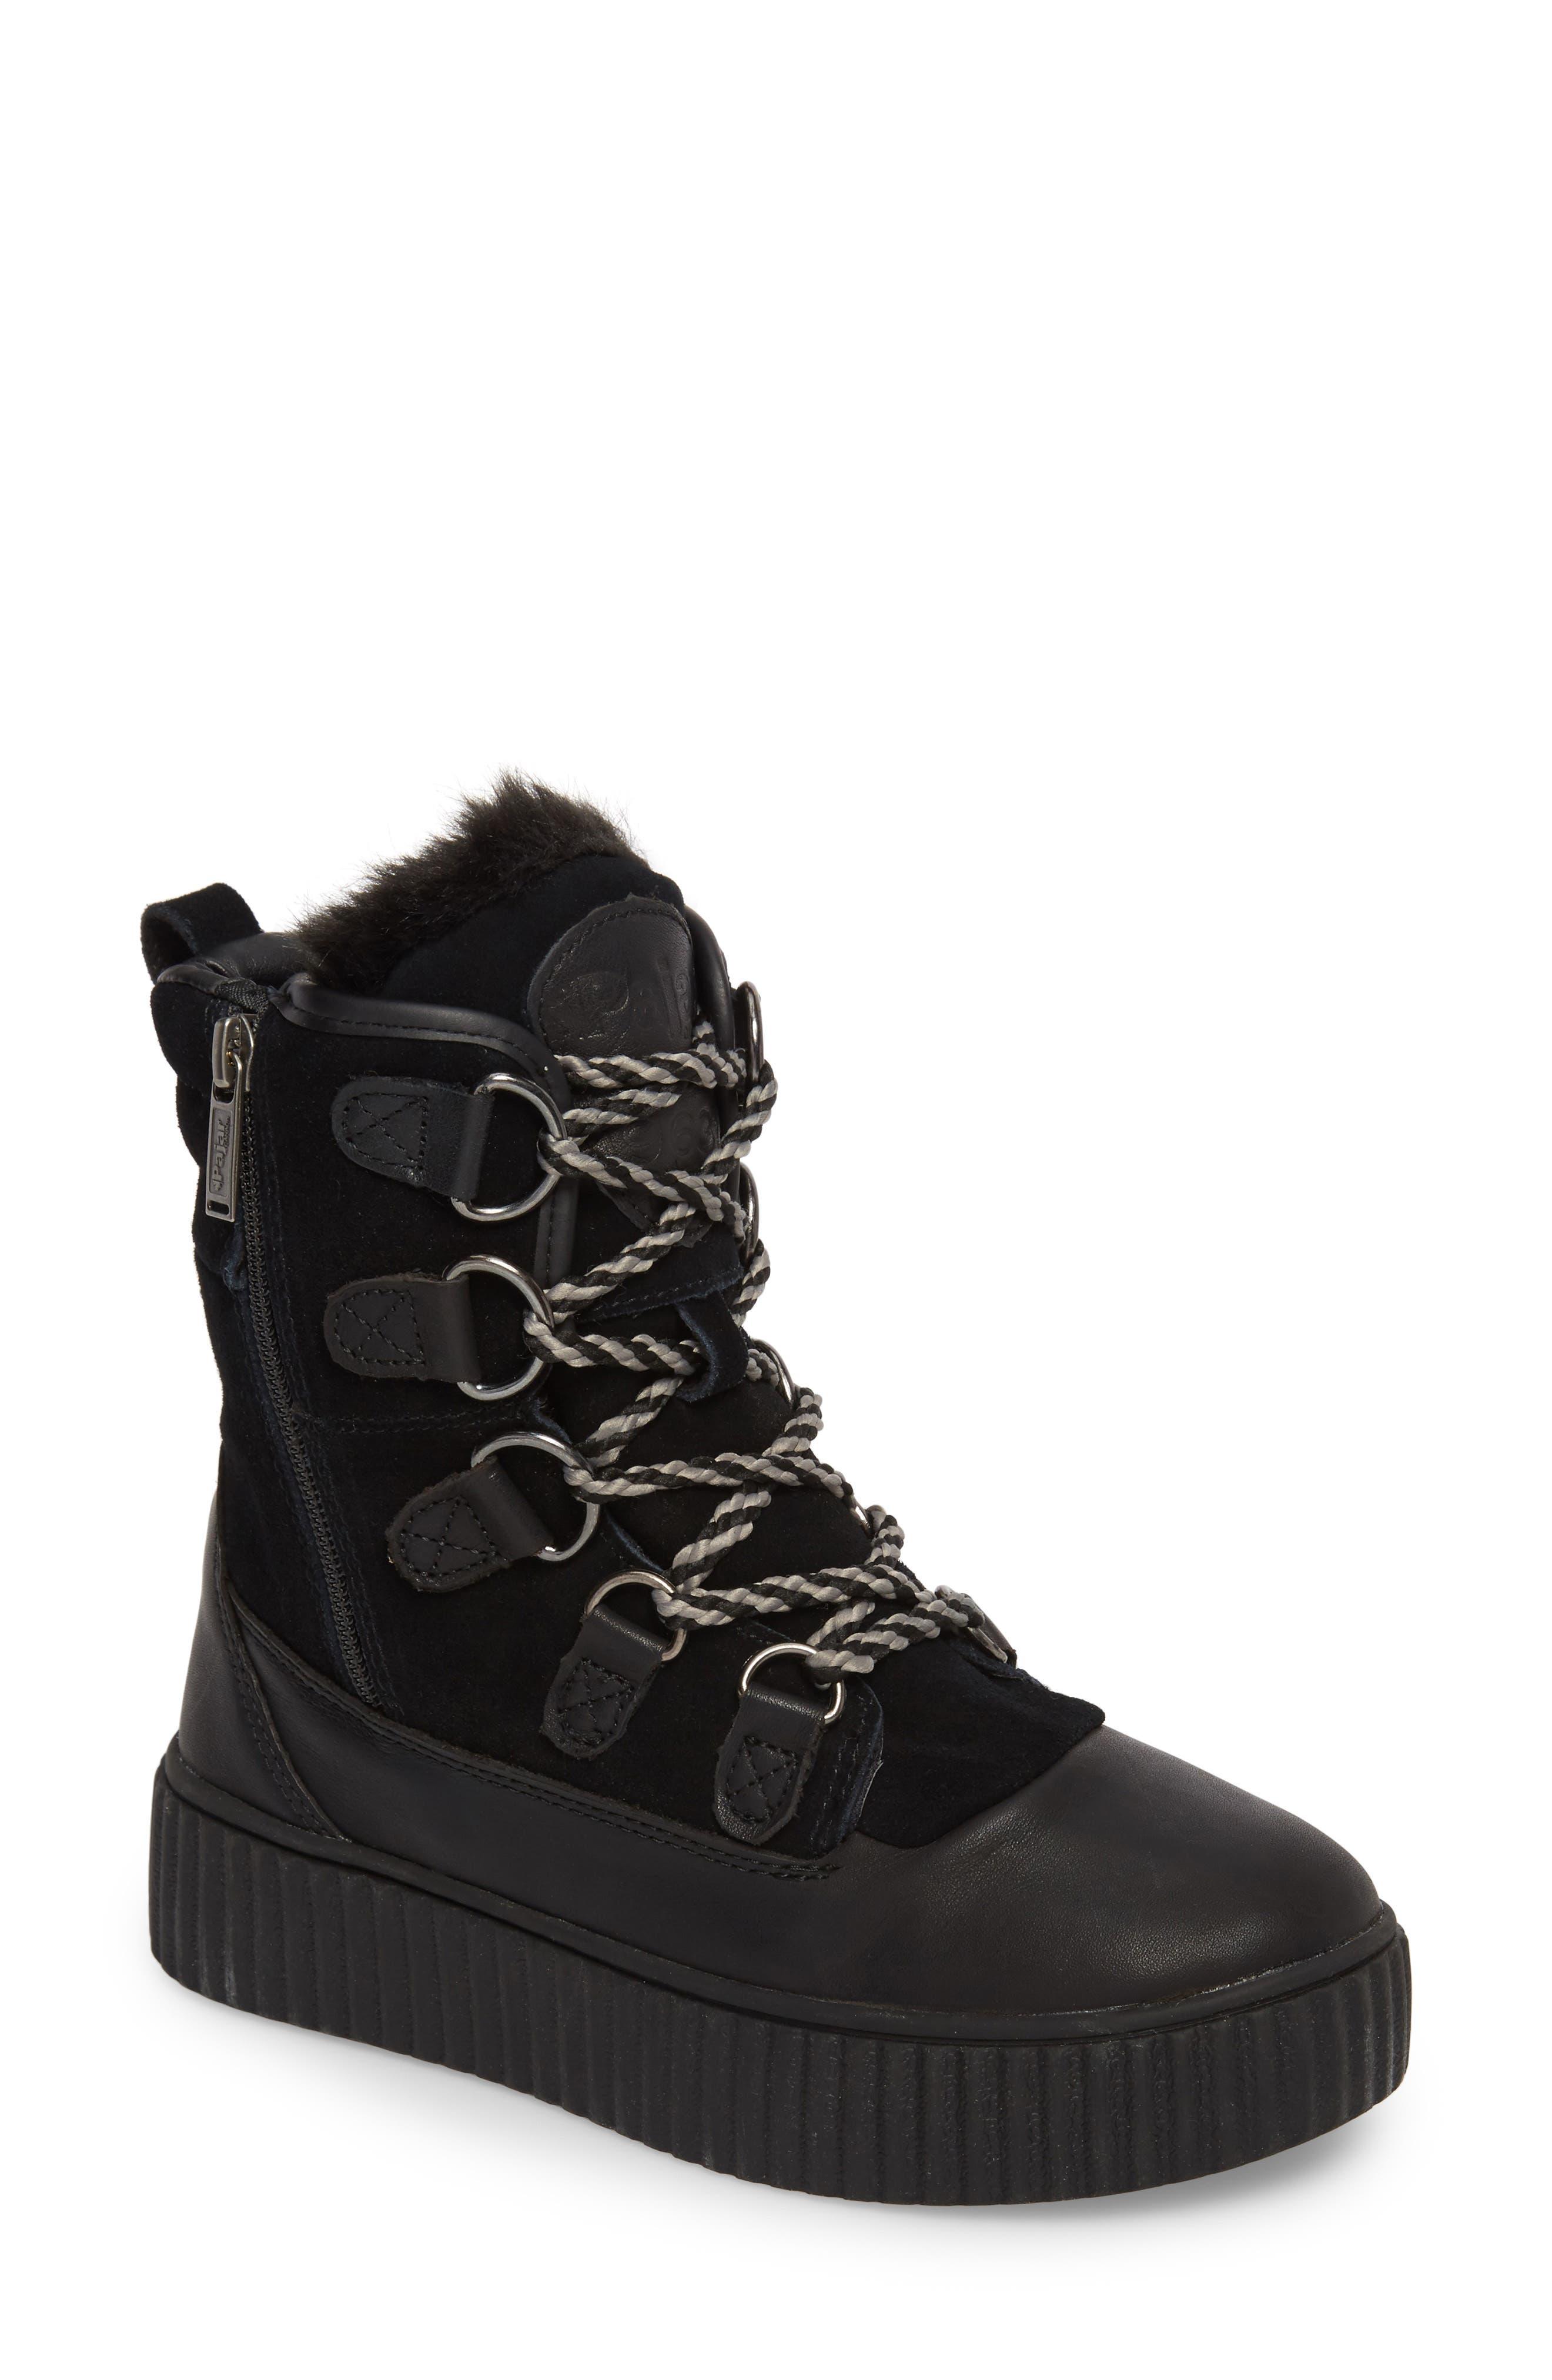 Pajar Cade Waterproof Insulated Snow Boot (Women)